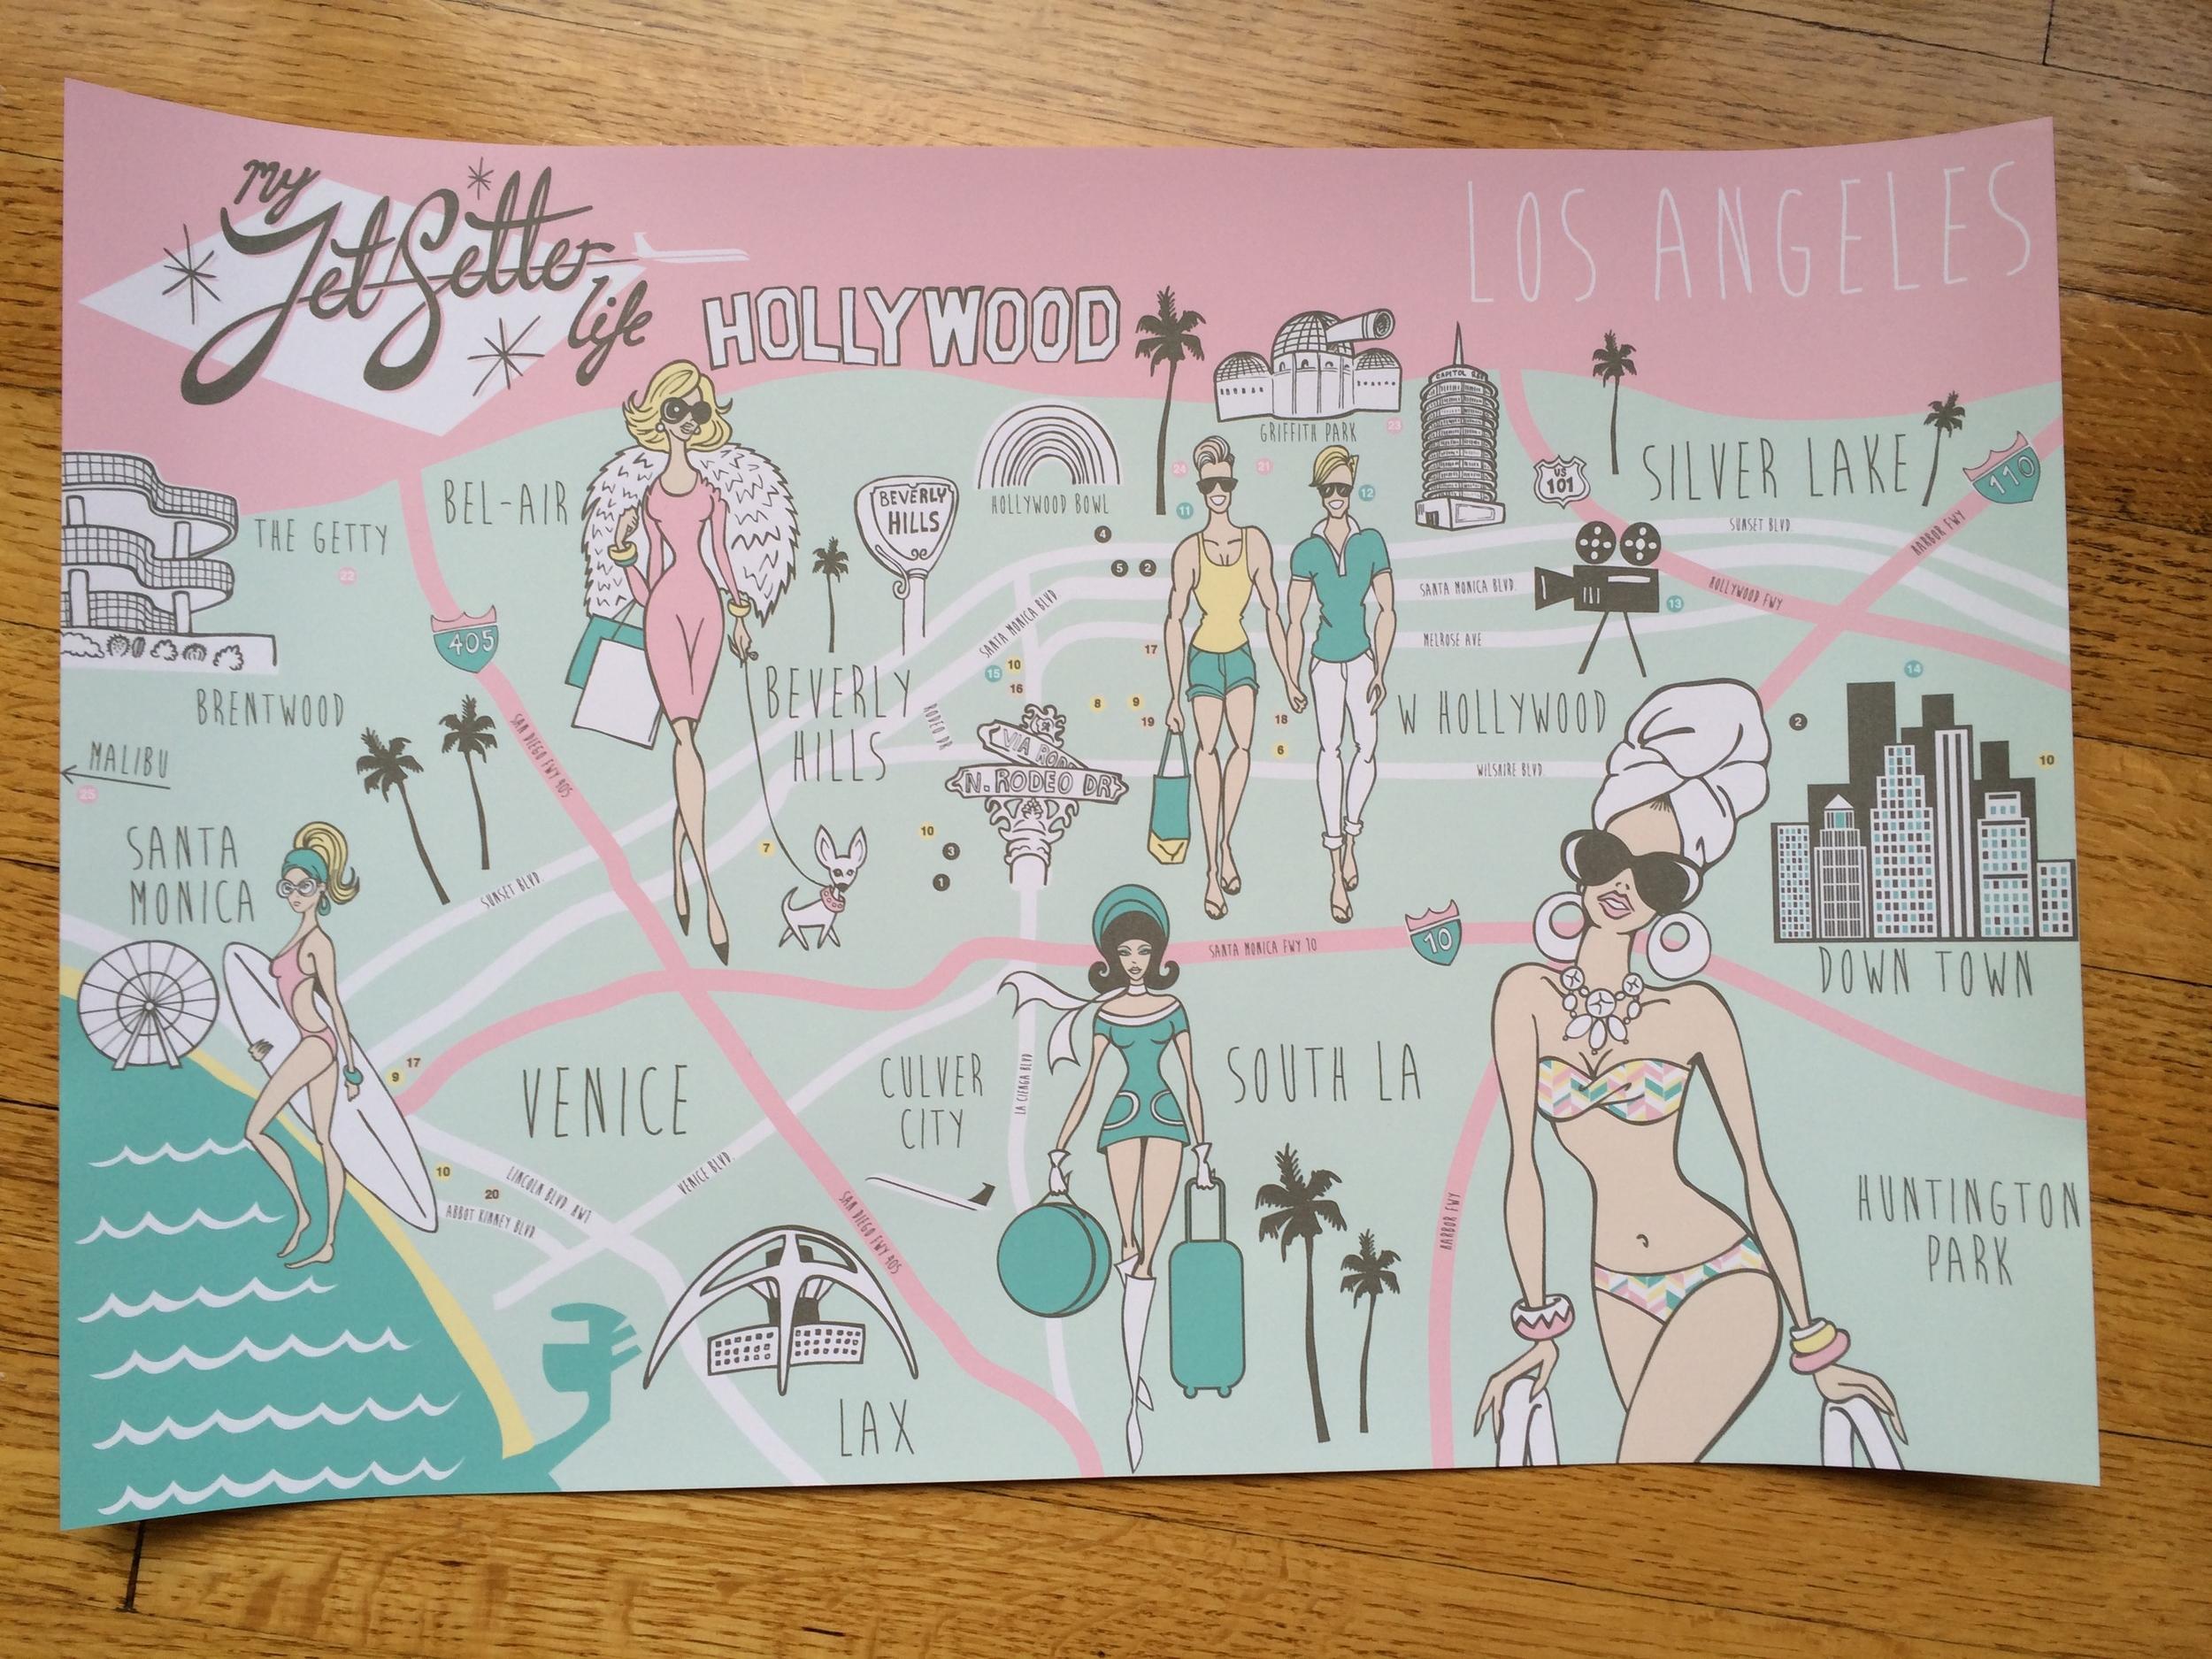 My JetSetter Life Los Angeles map